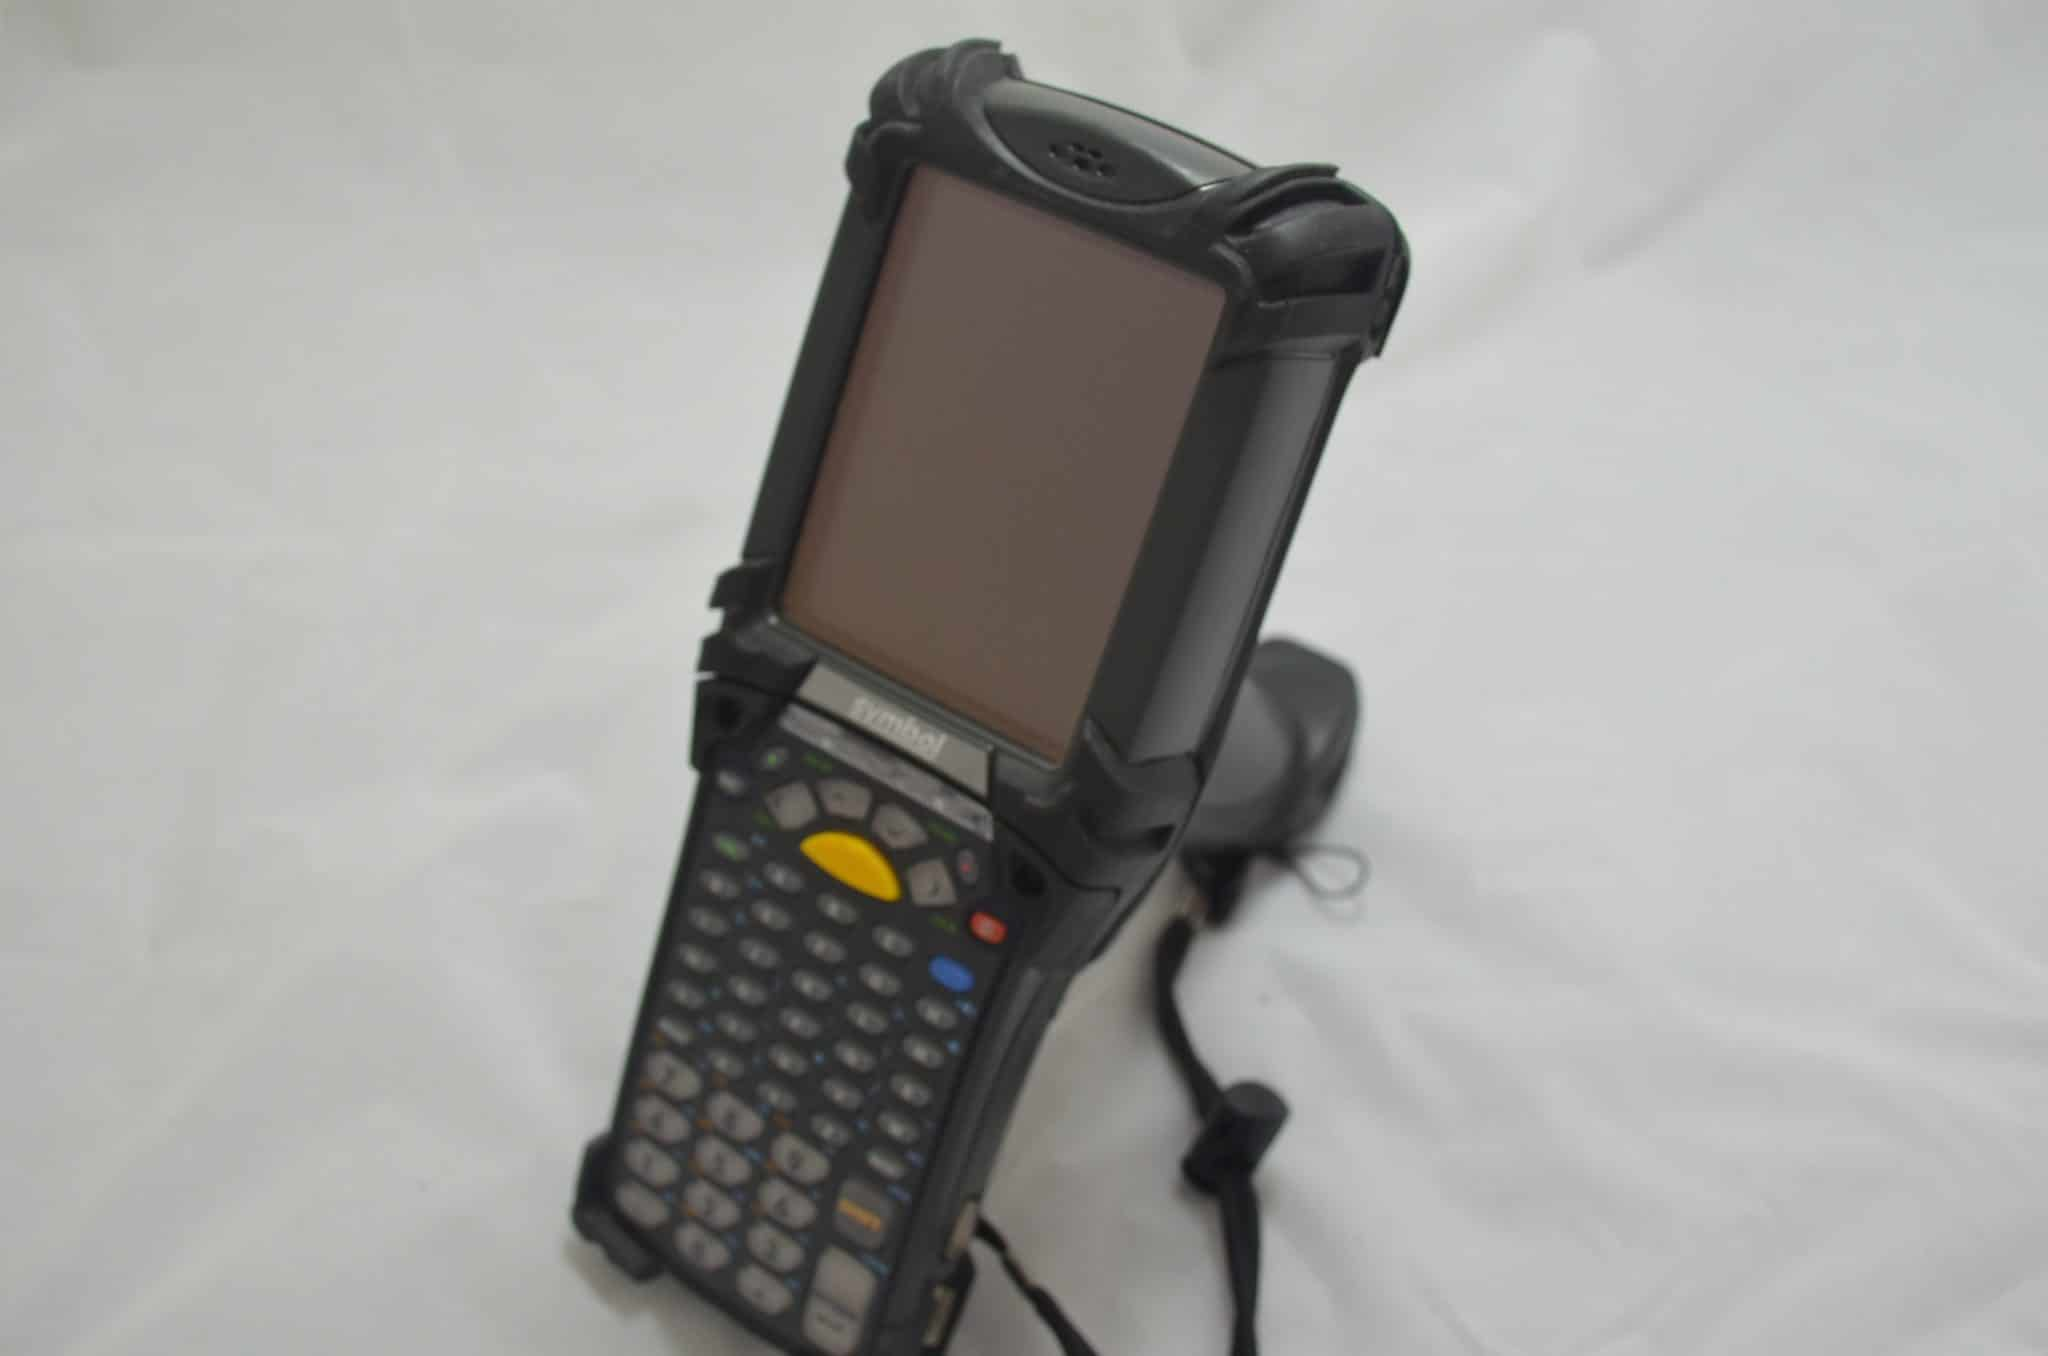 Symbol-Motorola MC9090 Handheld Scanner